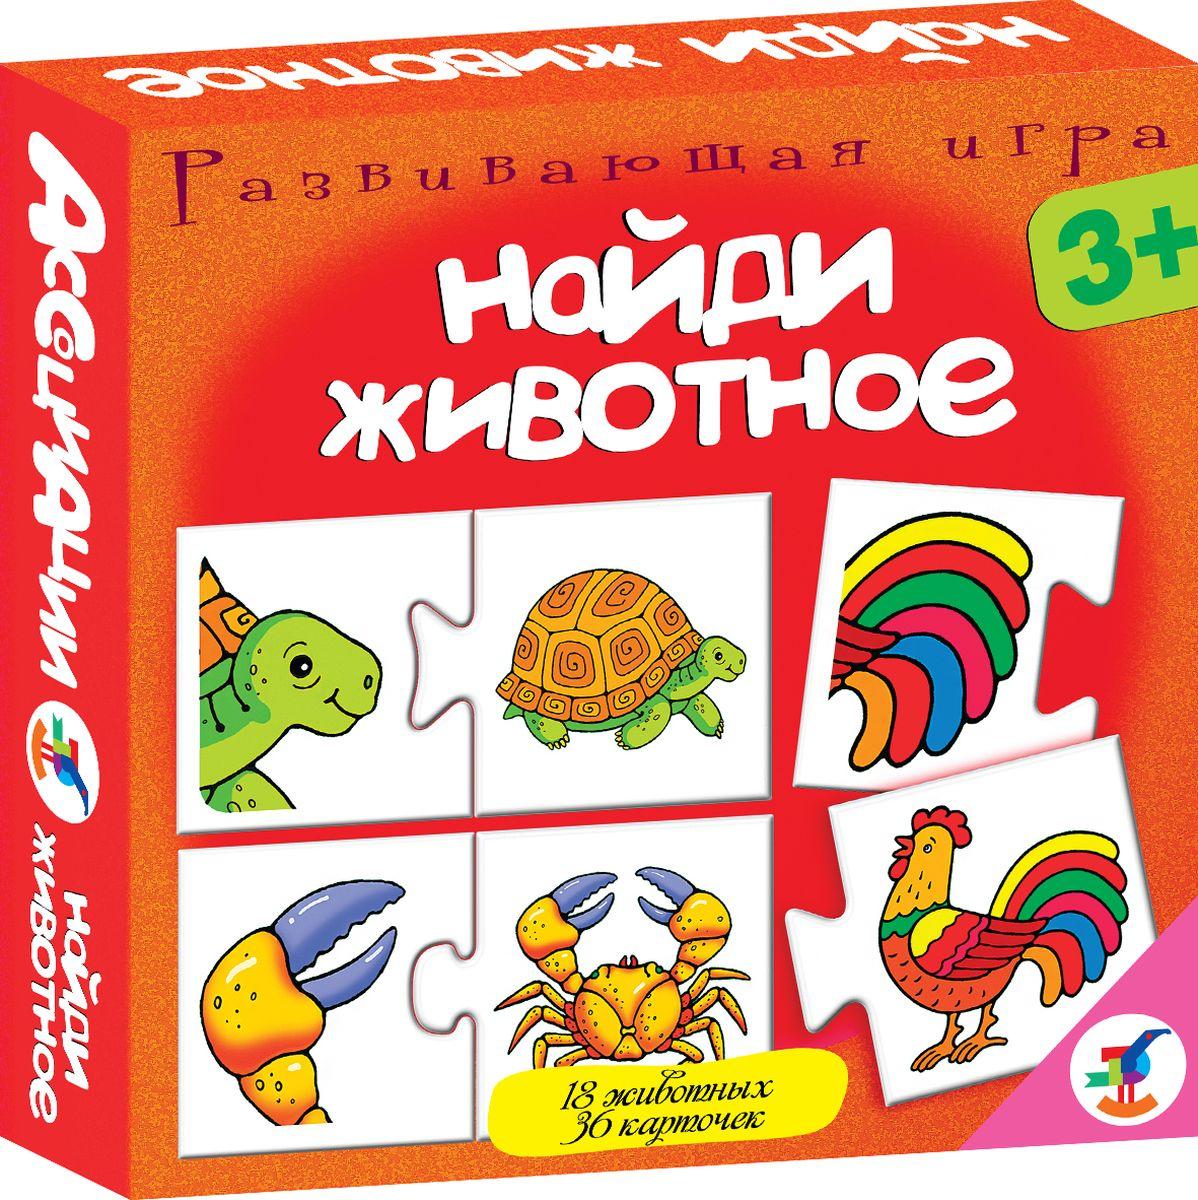 Дрофа-Медиа Пазл для малышей Найди животное дрофа медиа пазл для малышей играй и собирай 4 в 1 2944